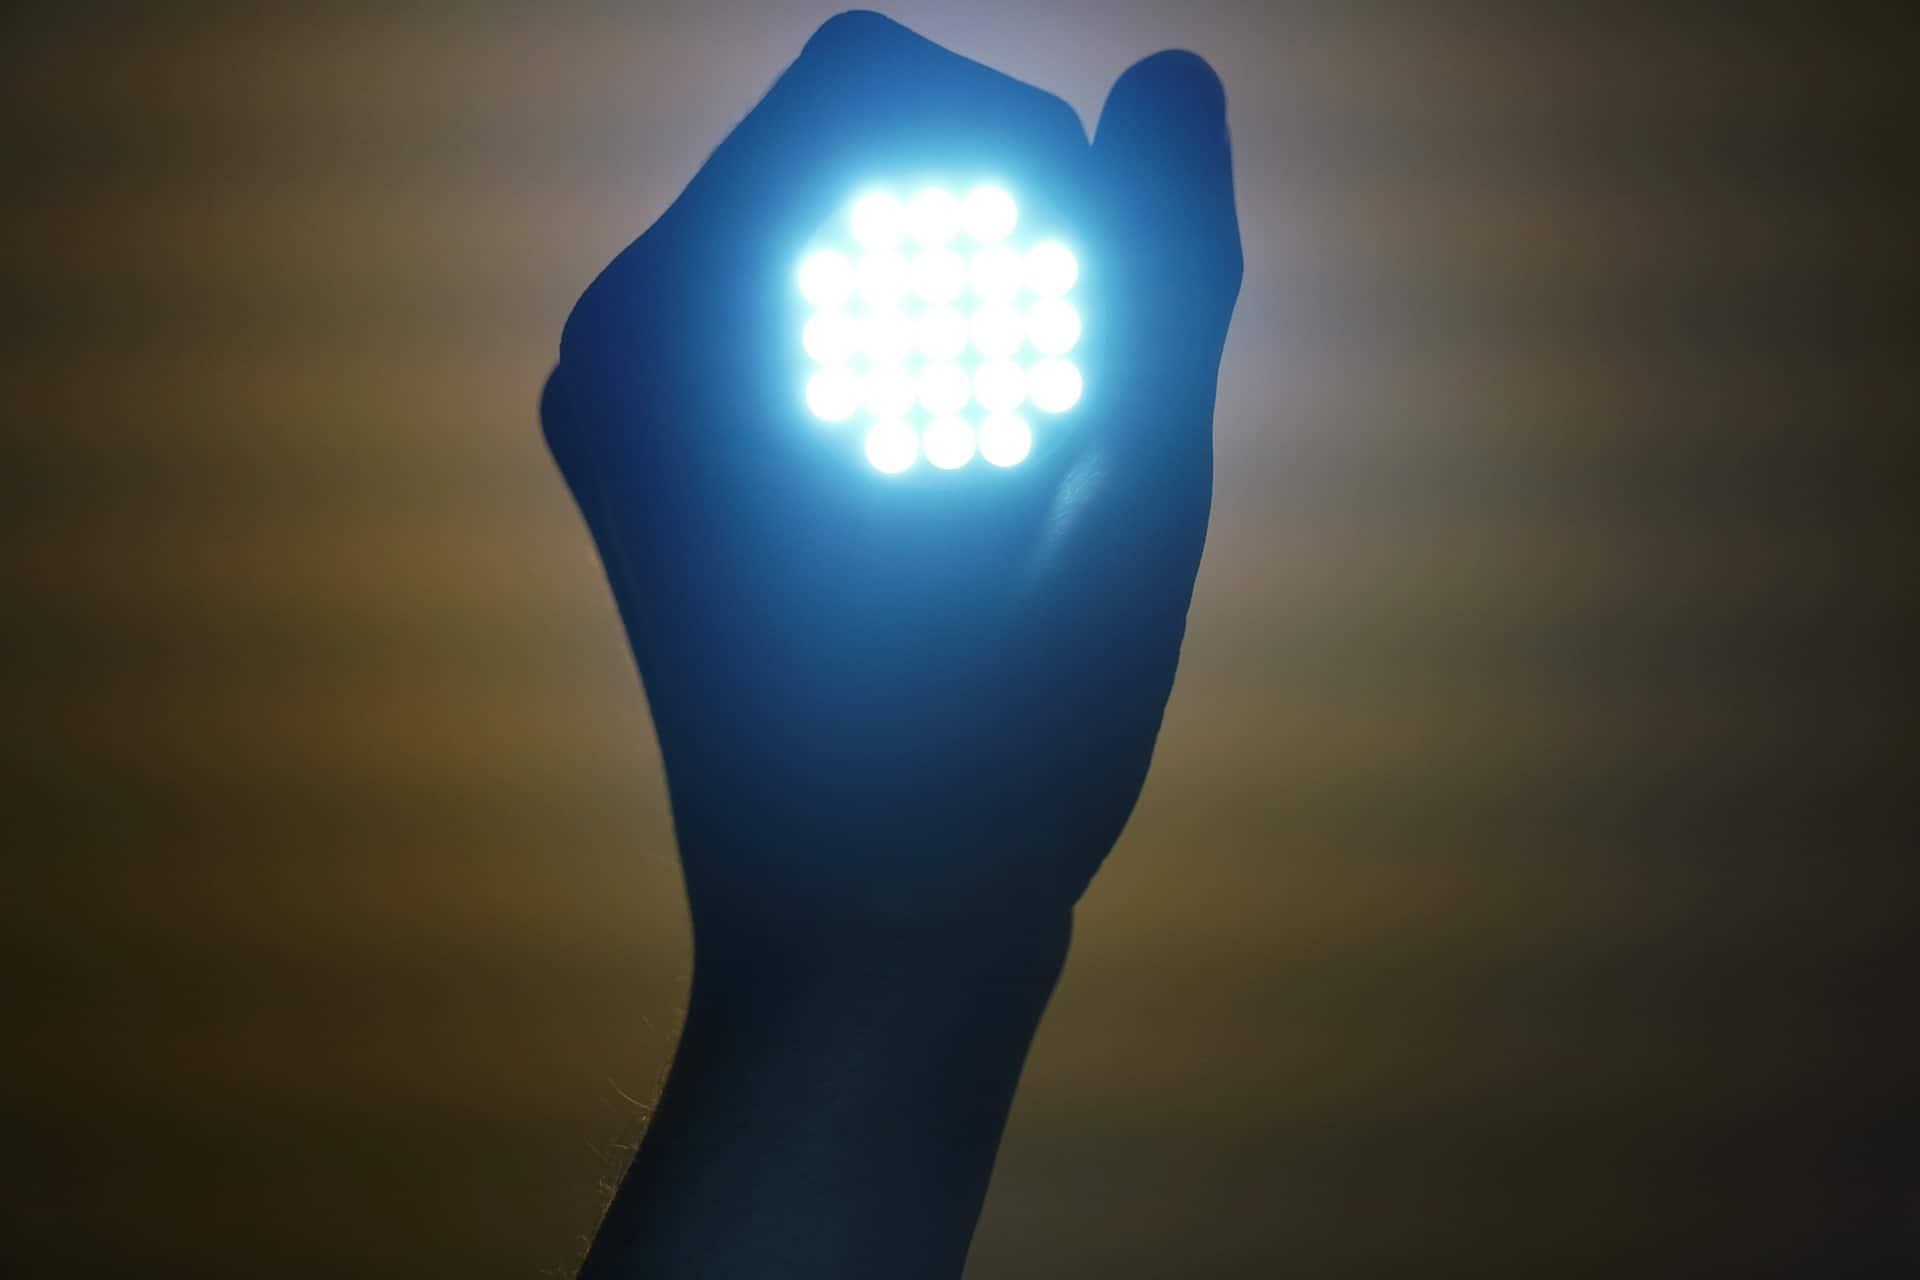 led lamp in de hand